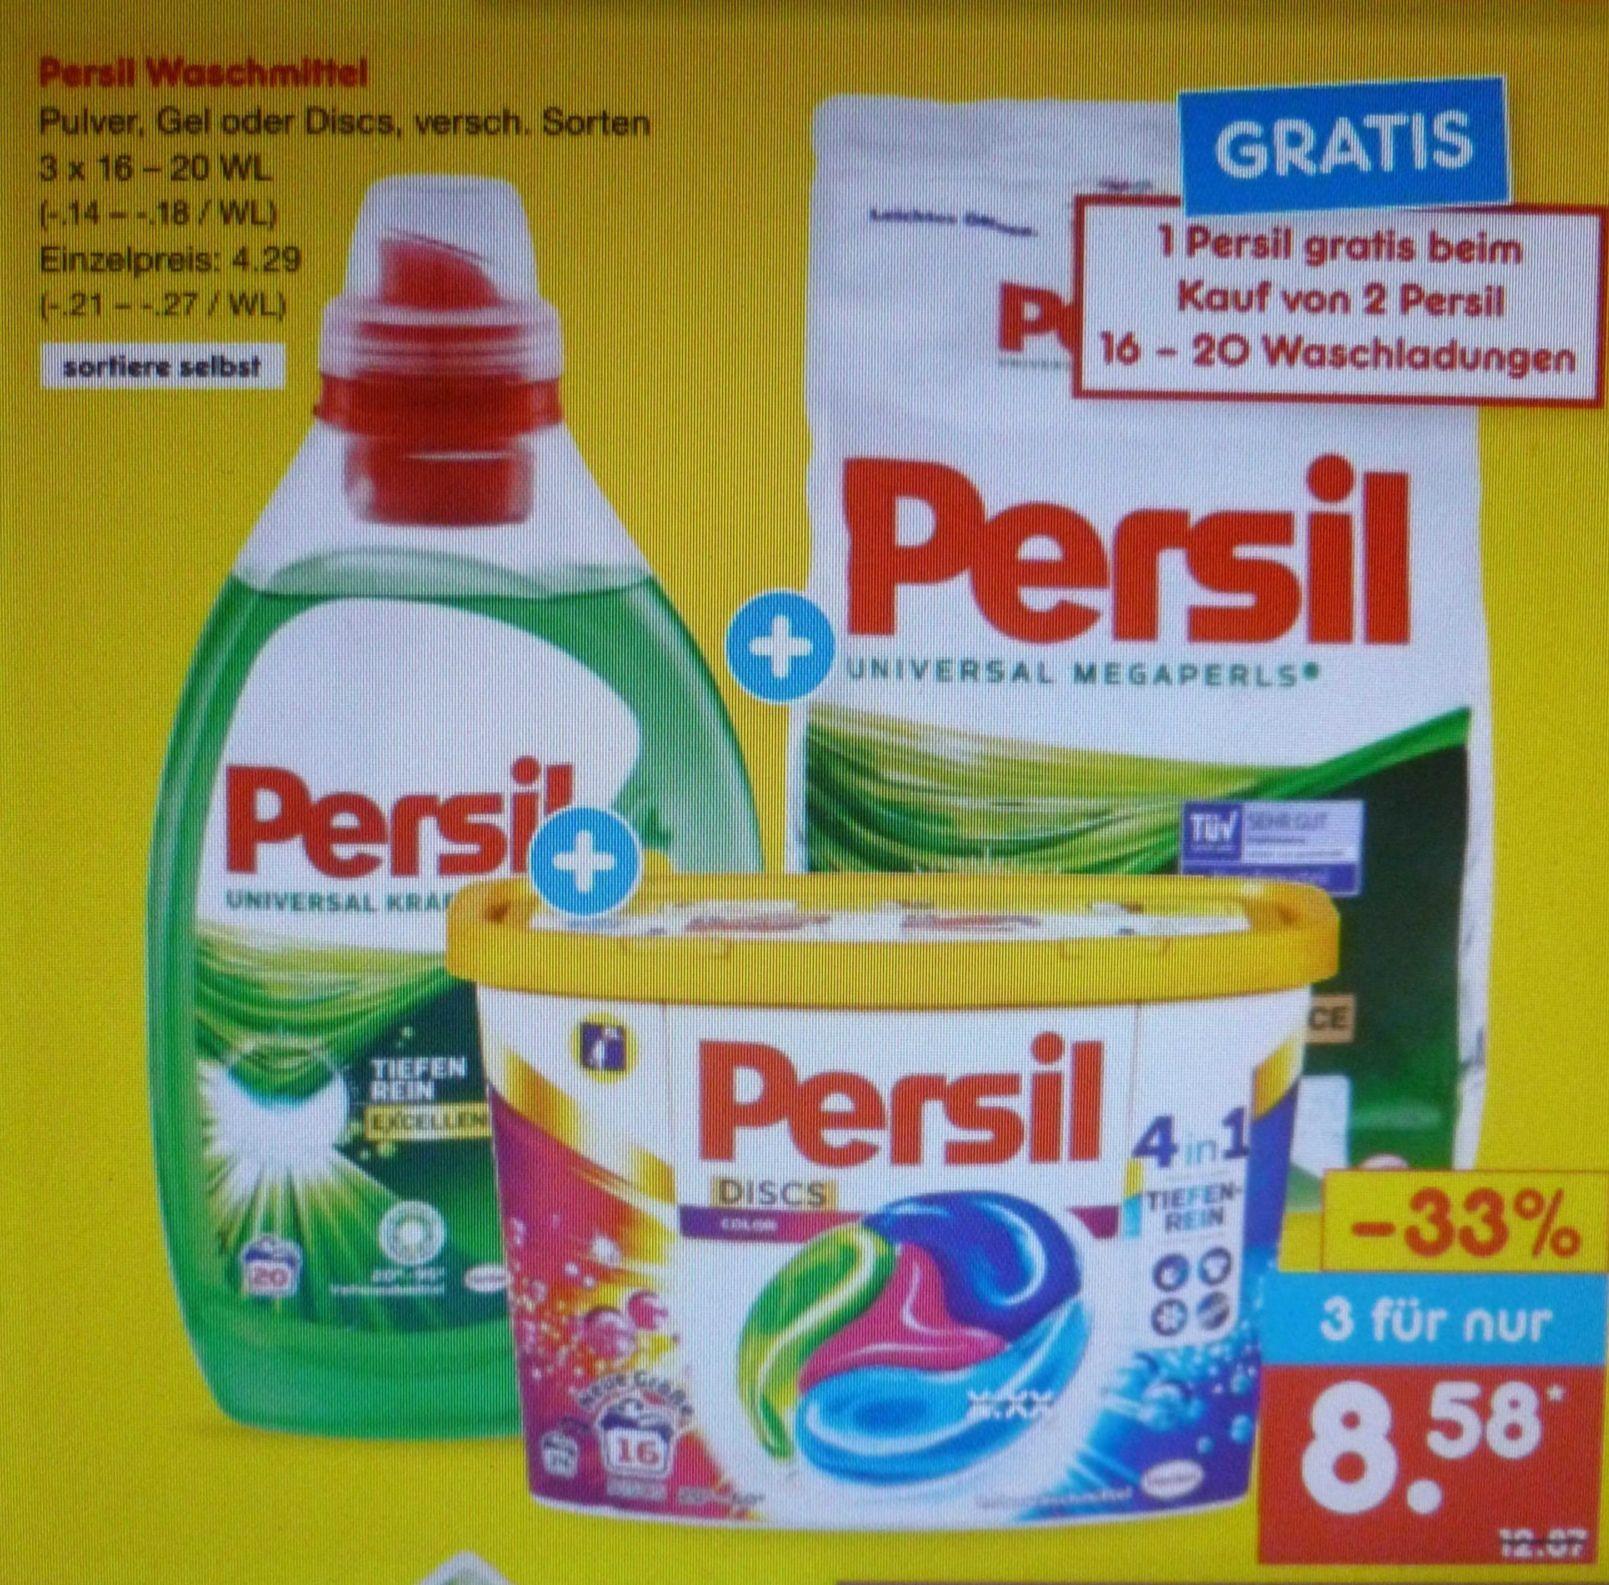 Persil Megaperls 3 kaufen - 2 zahlen